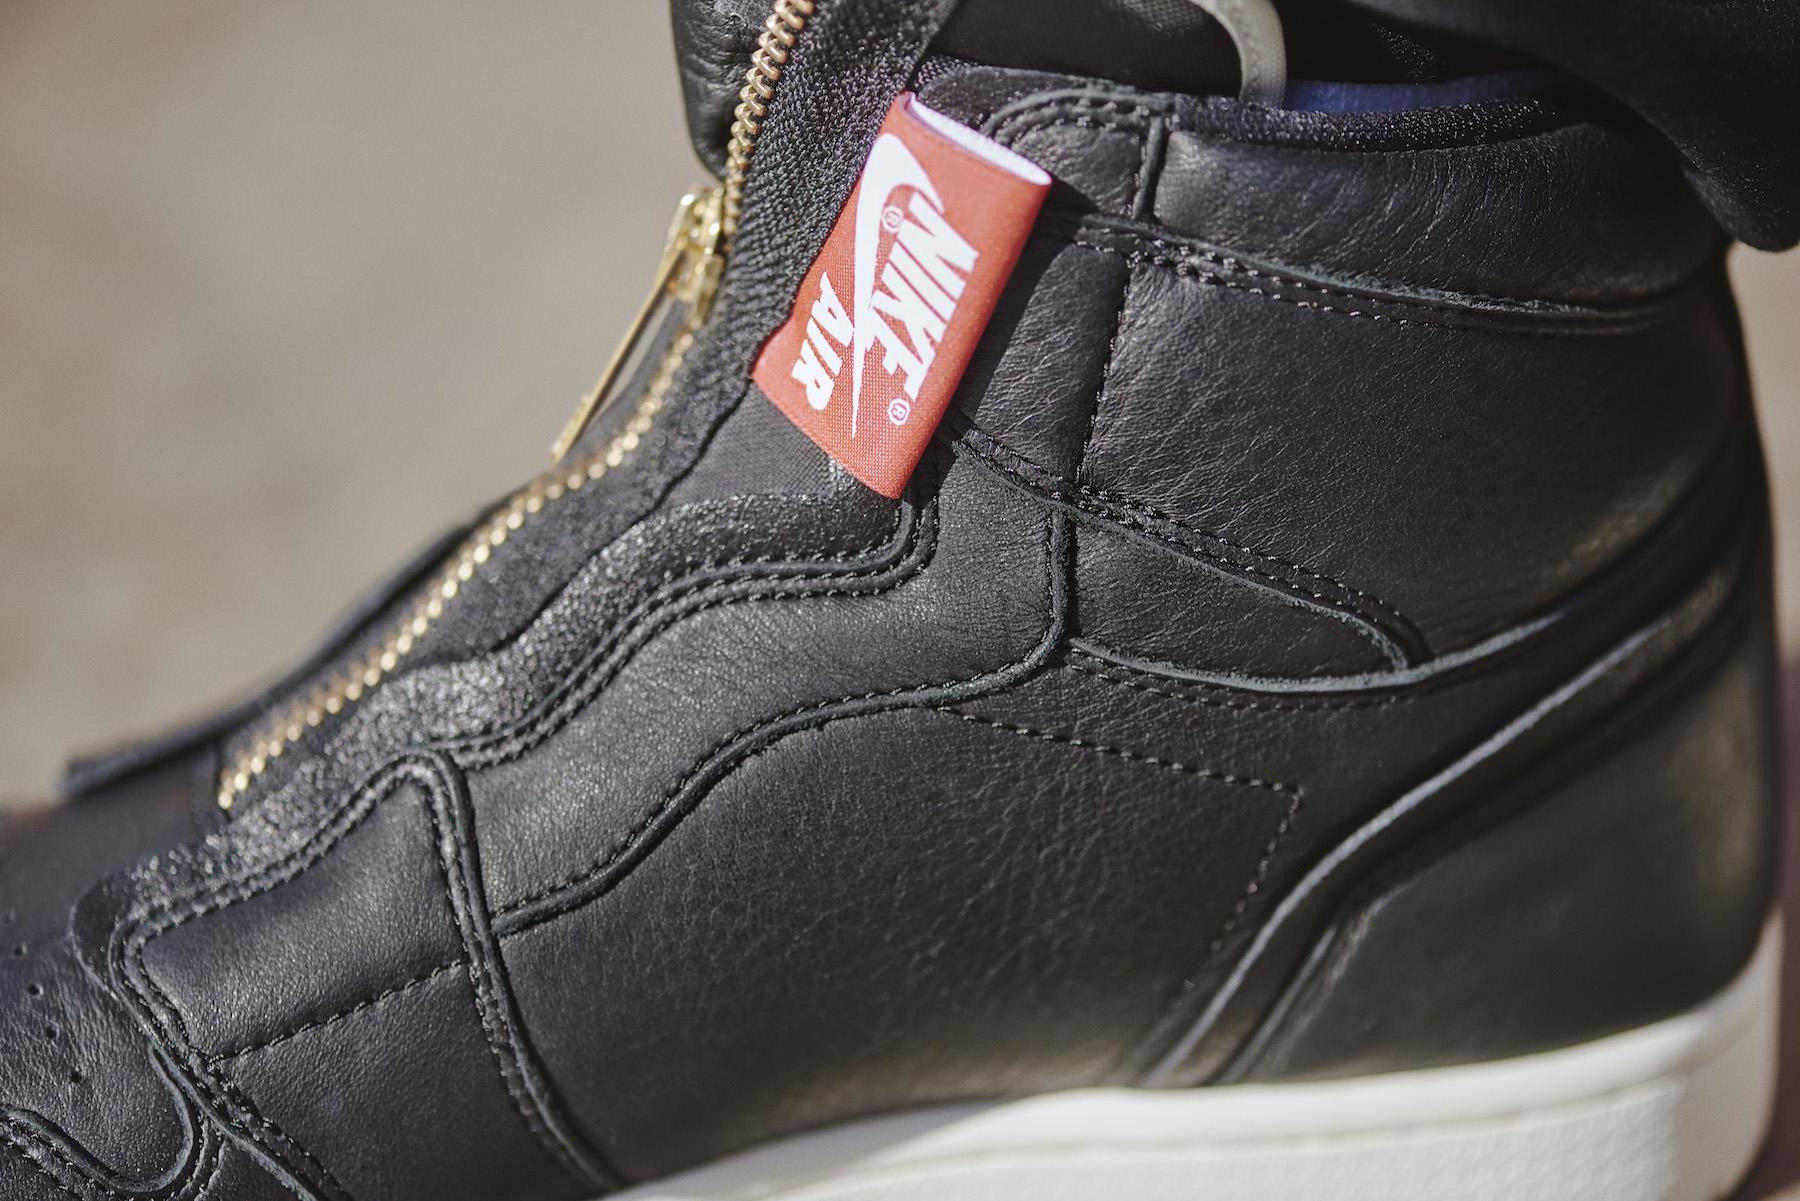 Jordan Shoes Zipper